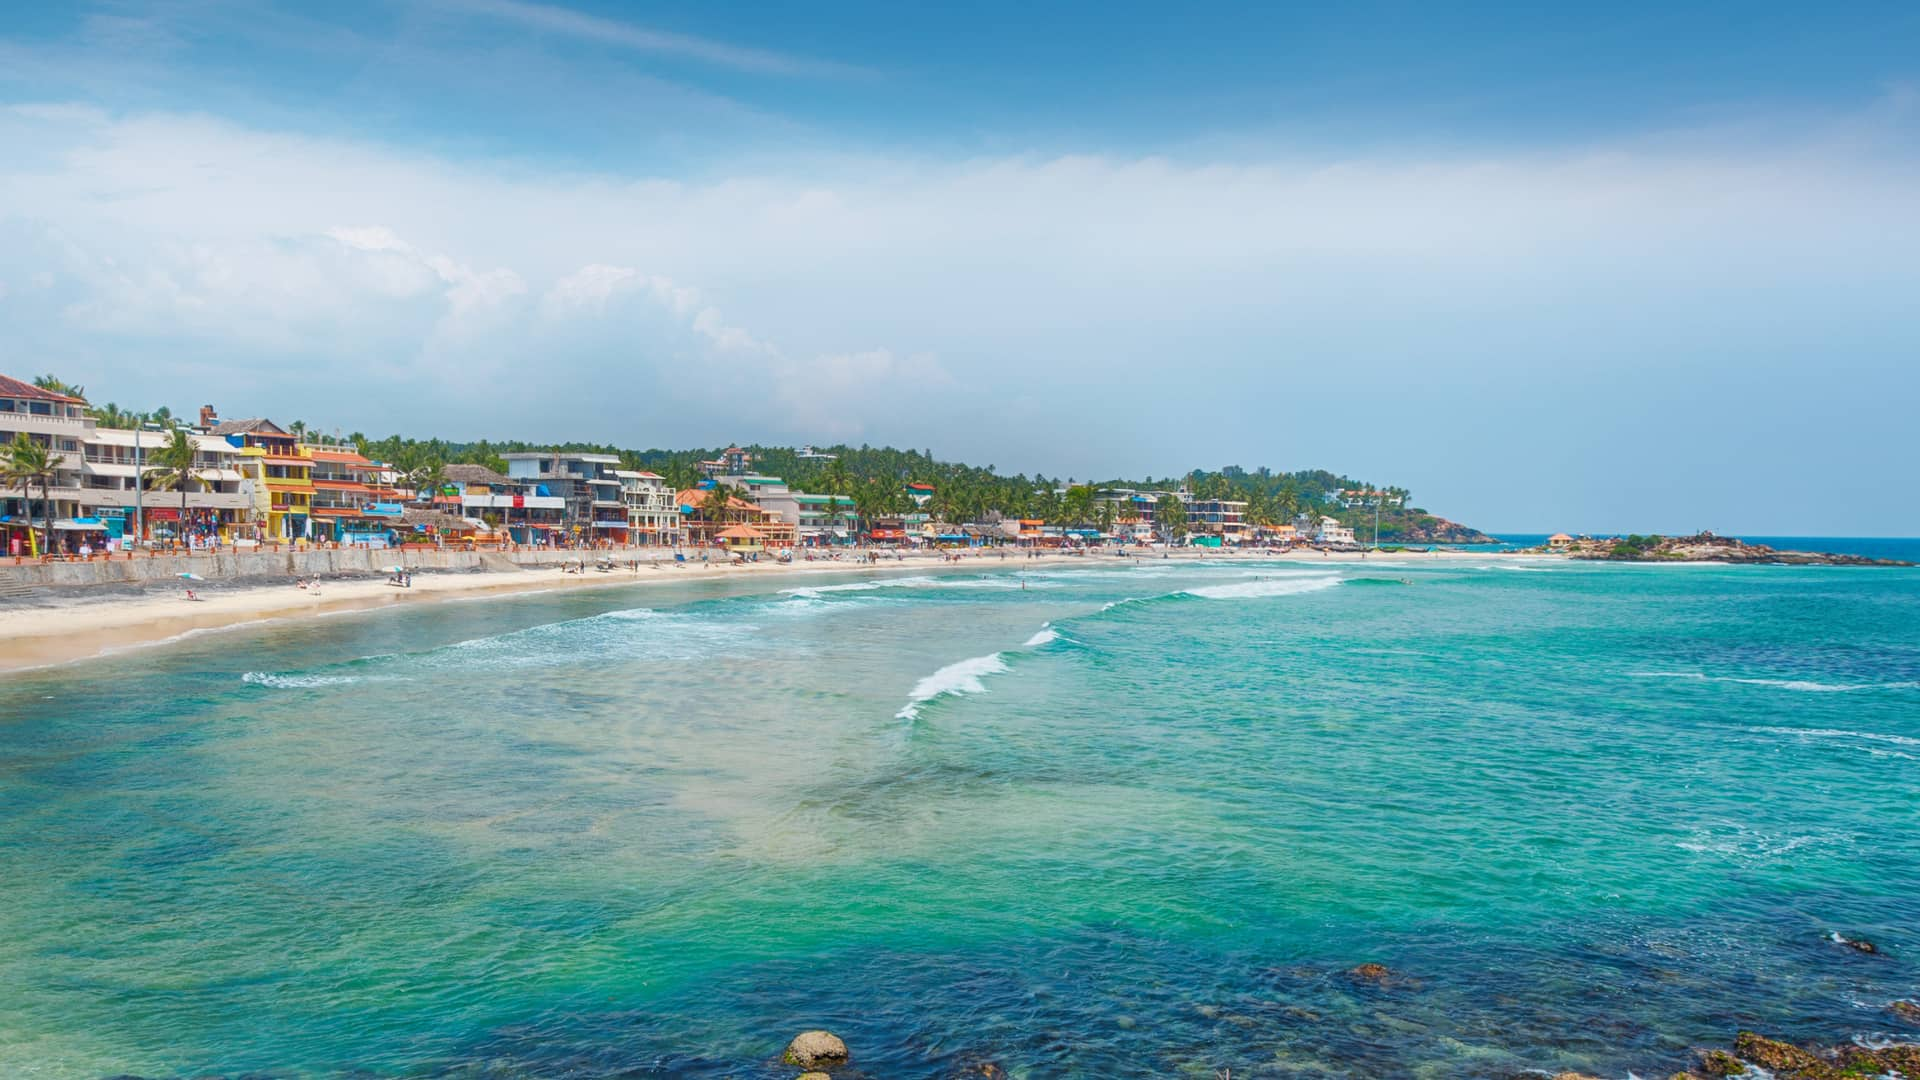 La mejor playa en Kerala es Kovalam una playa paradisiaca